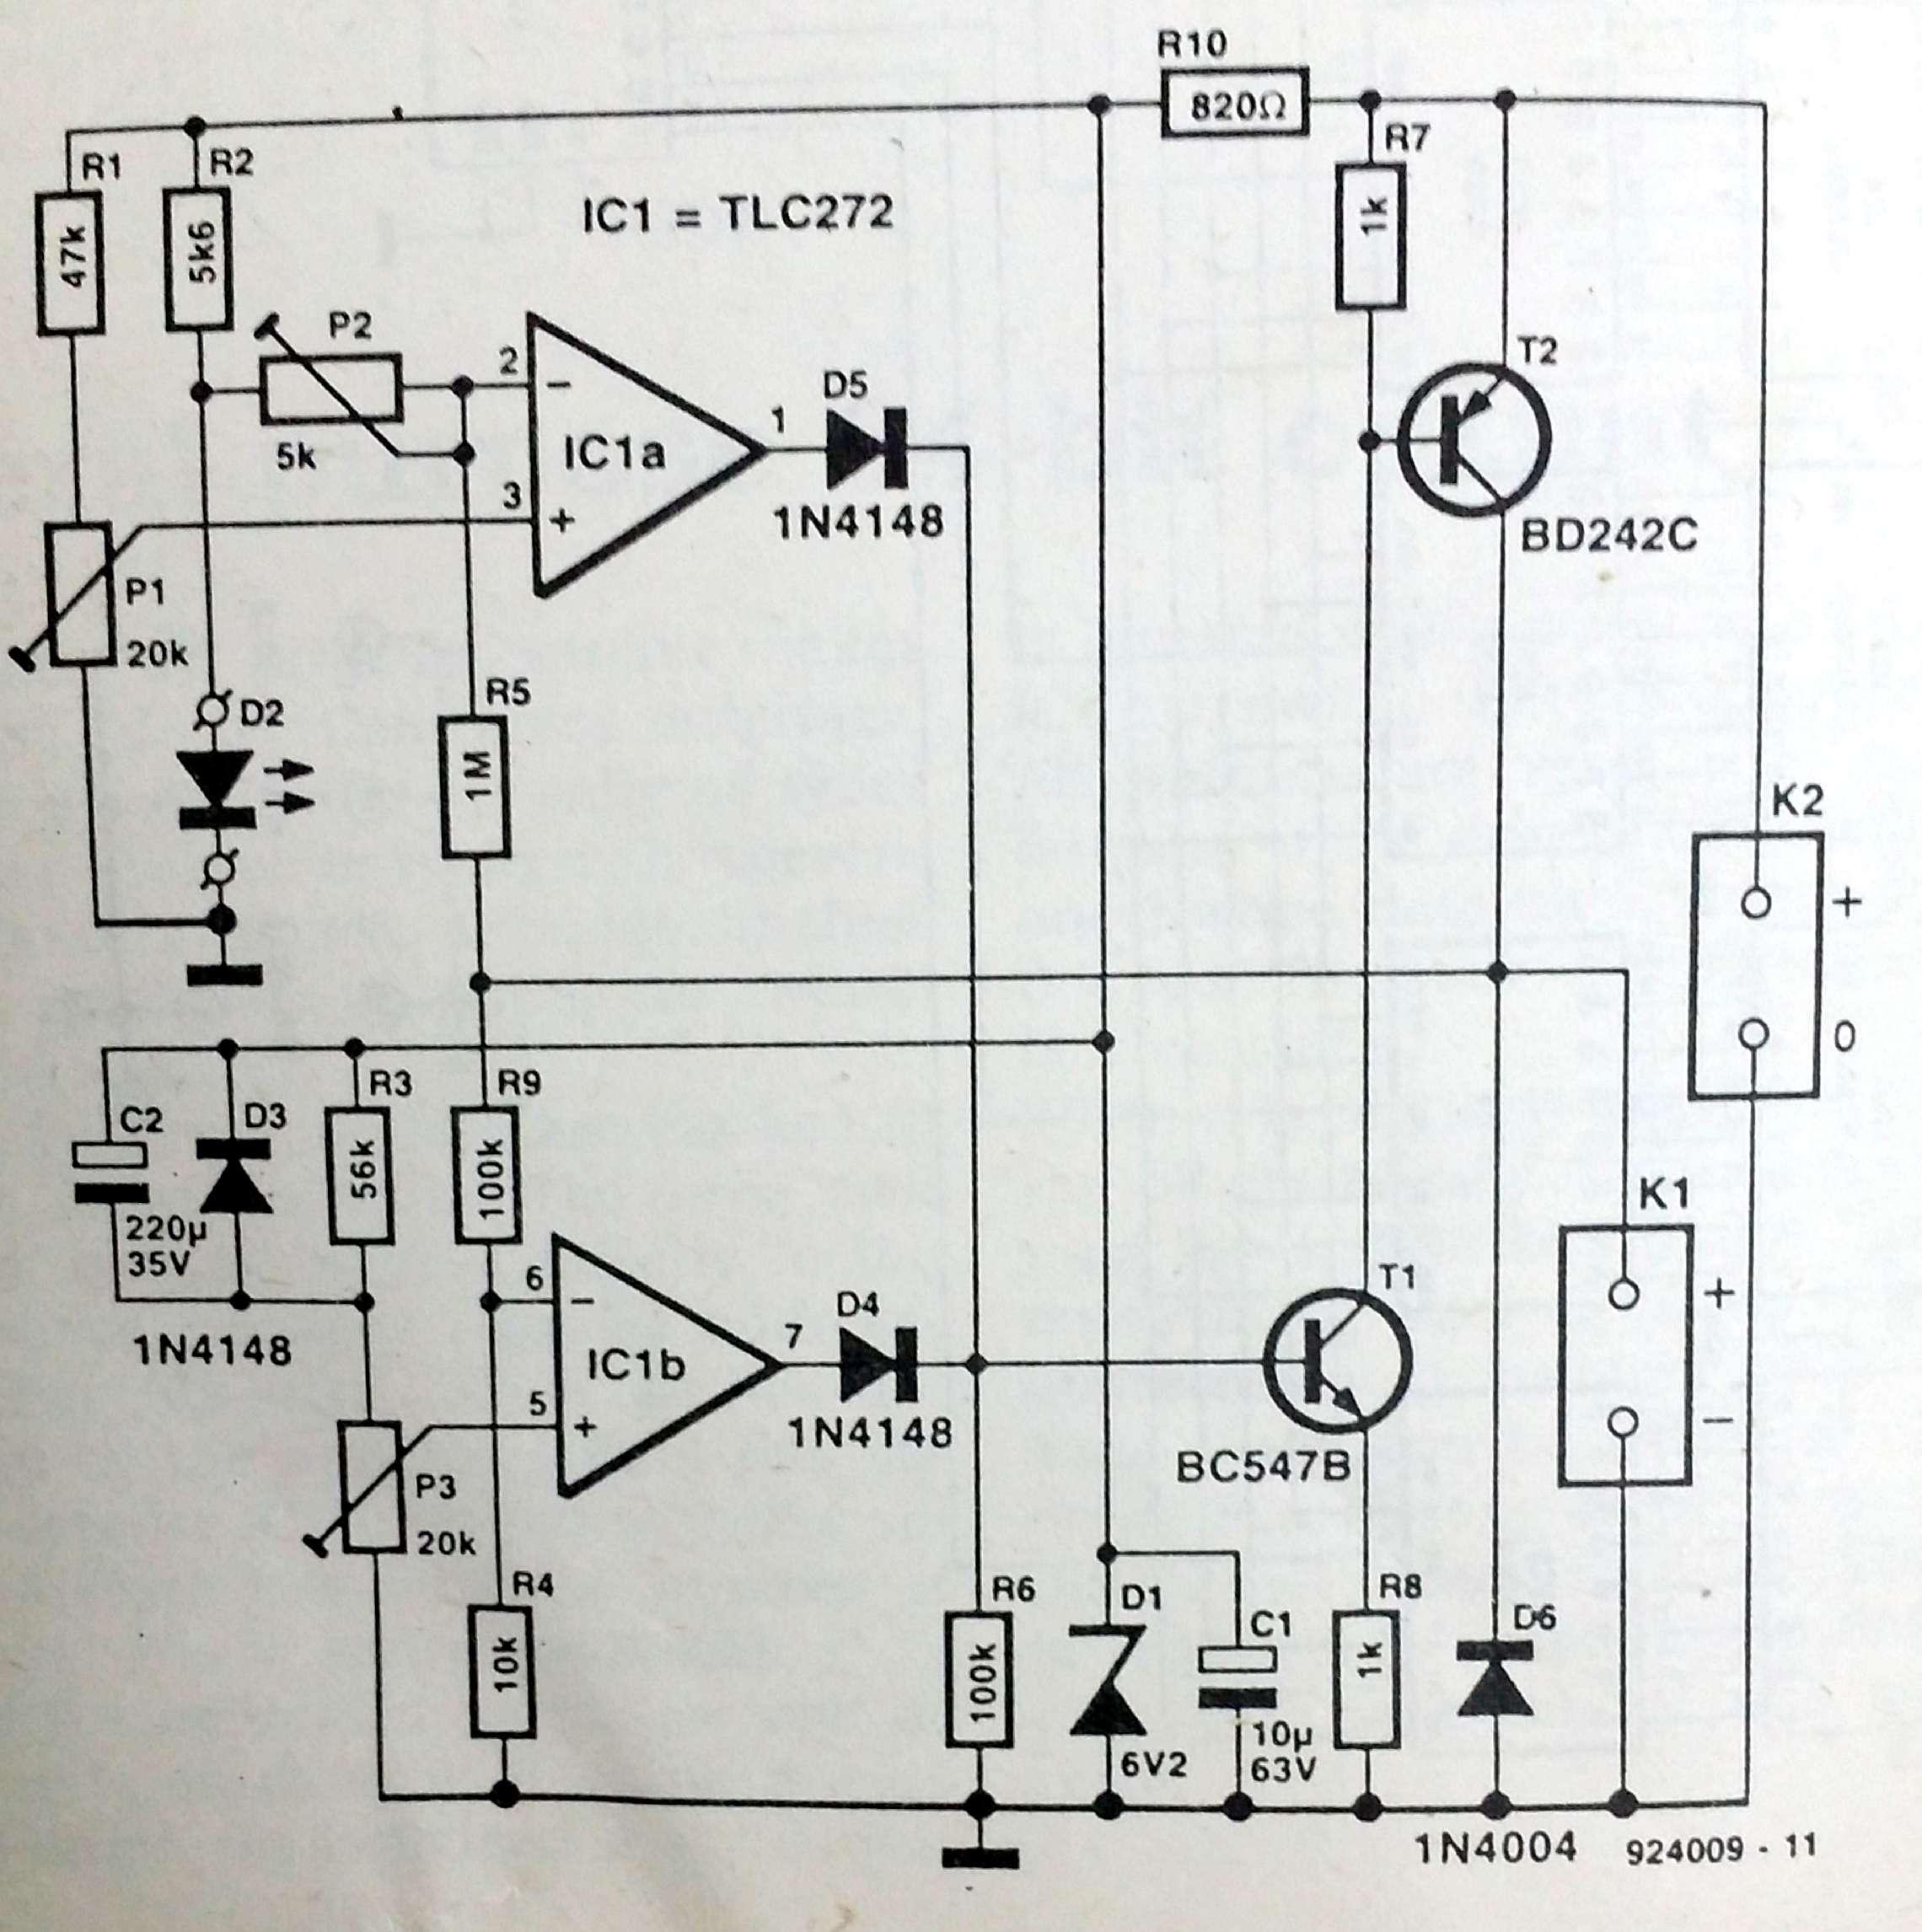 PC fan control Circuit